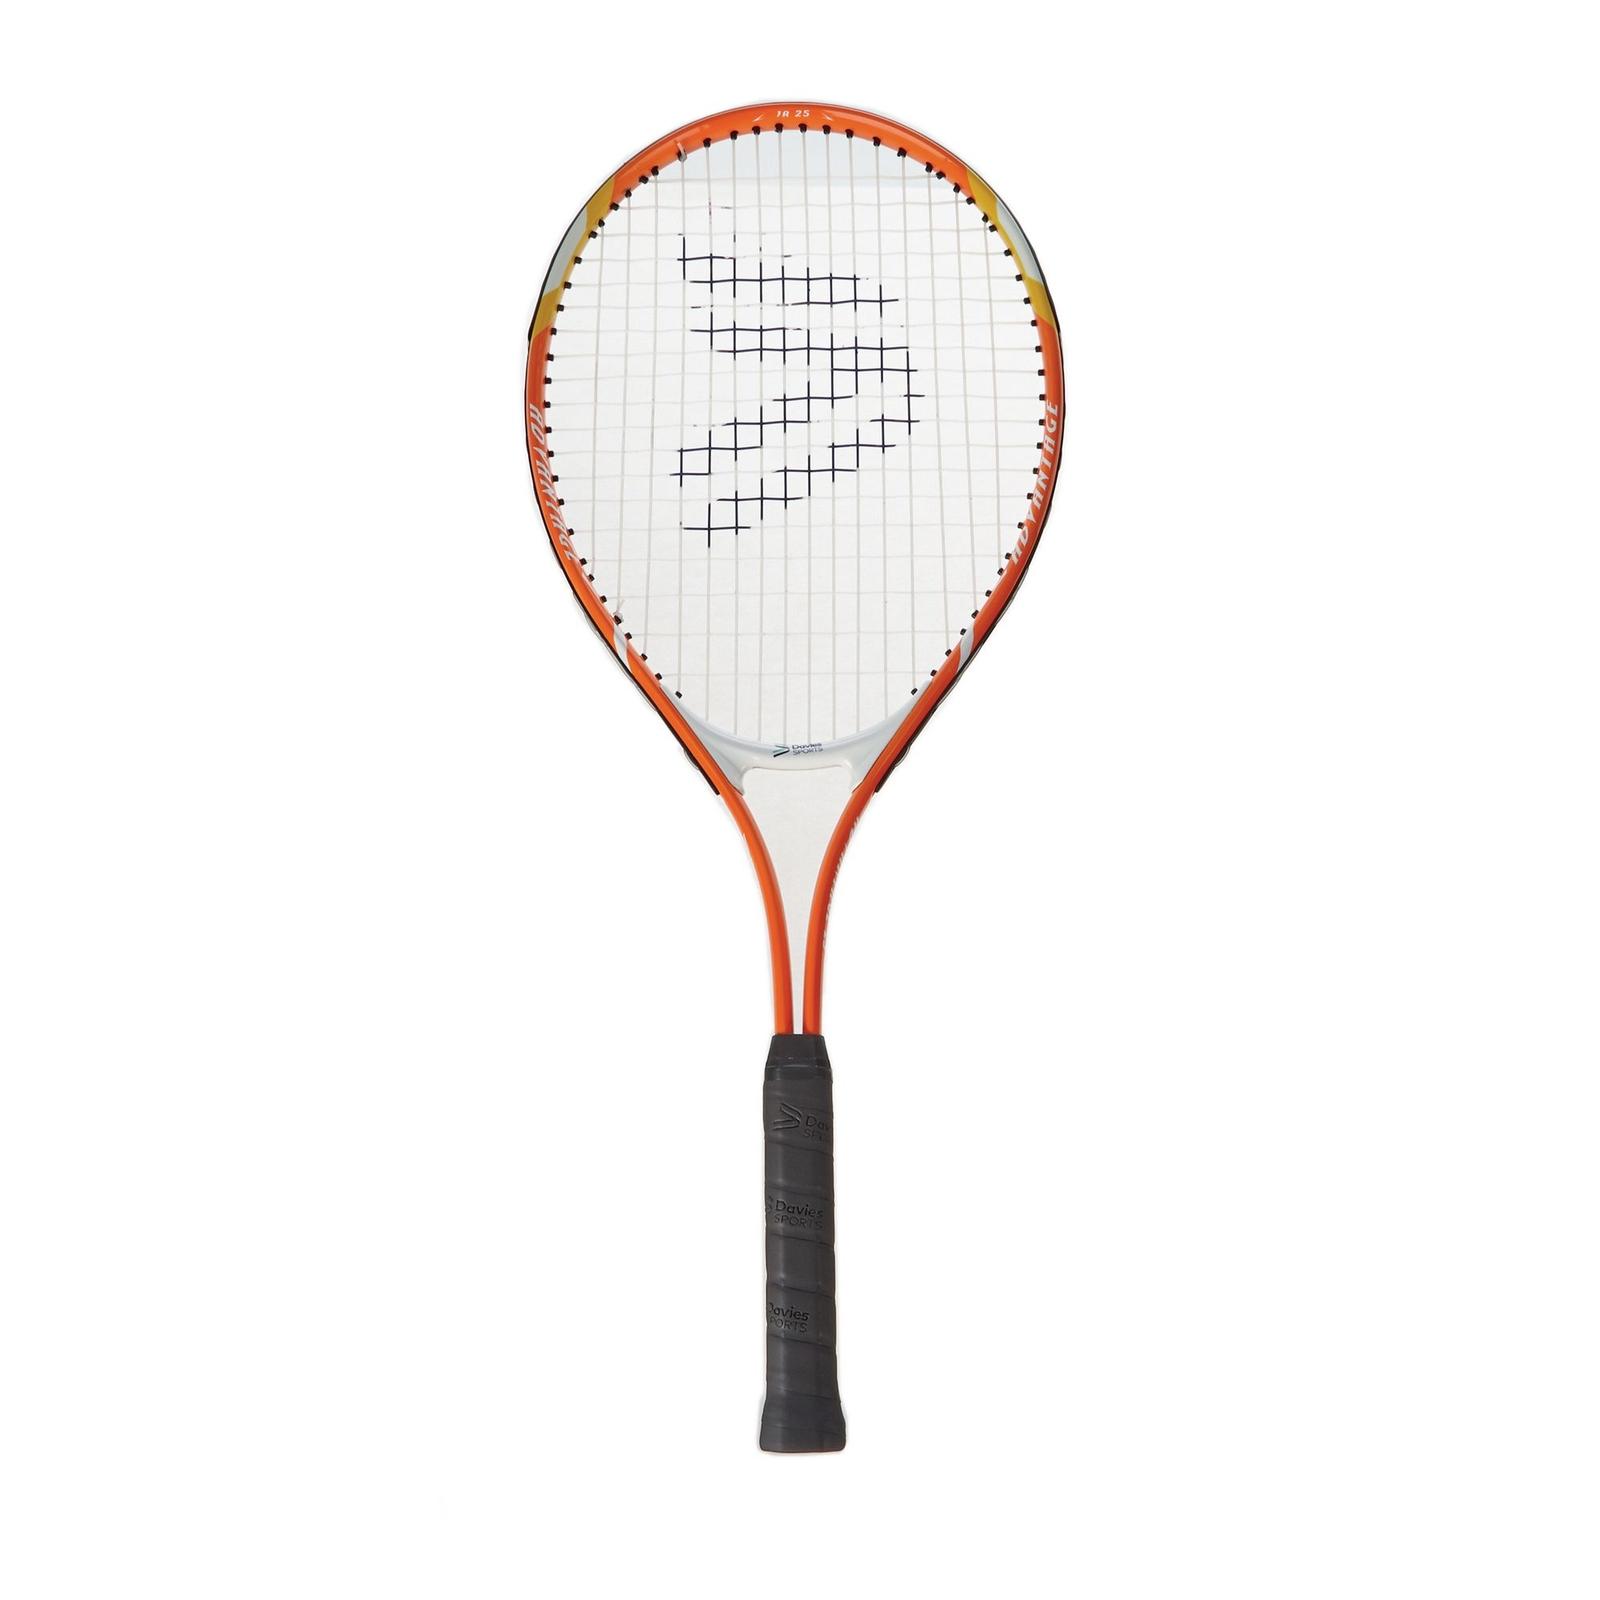 Davies Sports 25in Advantage Racquet